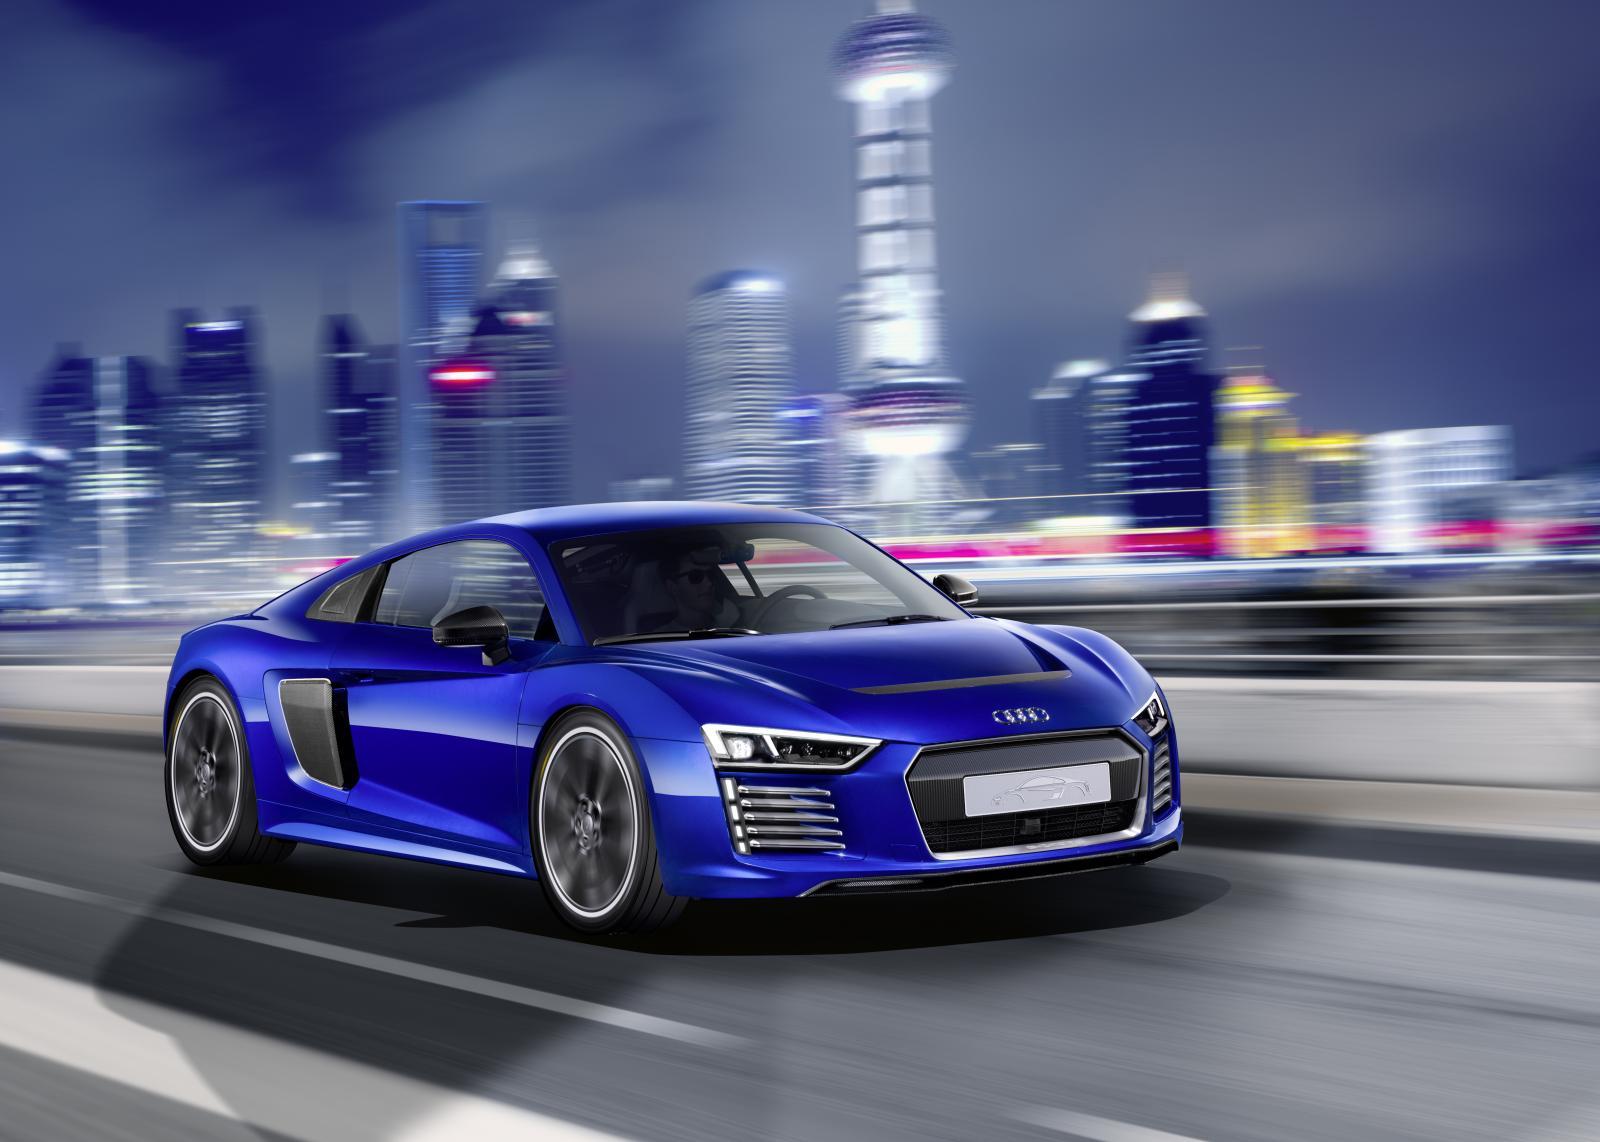 Audi-R8-e-tron-piloted-driving-concept-001.jpg